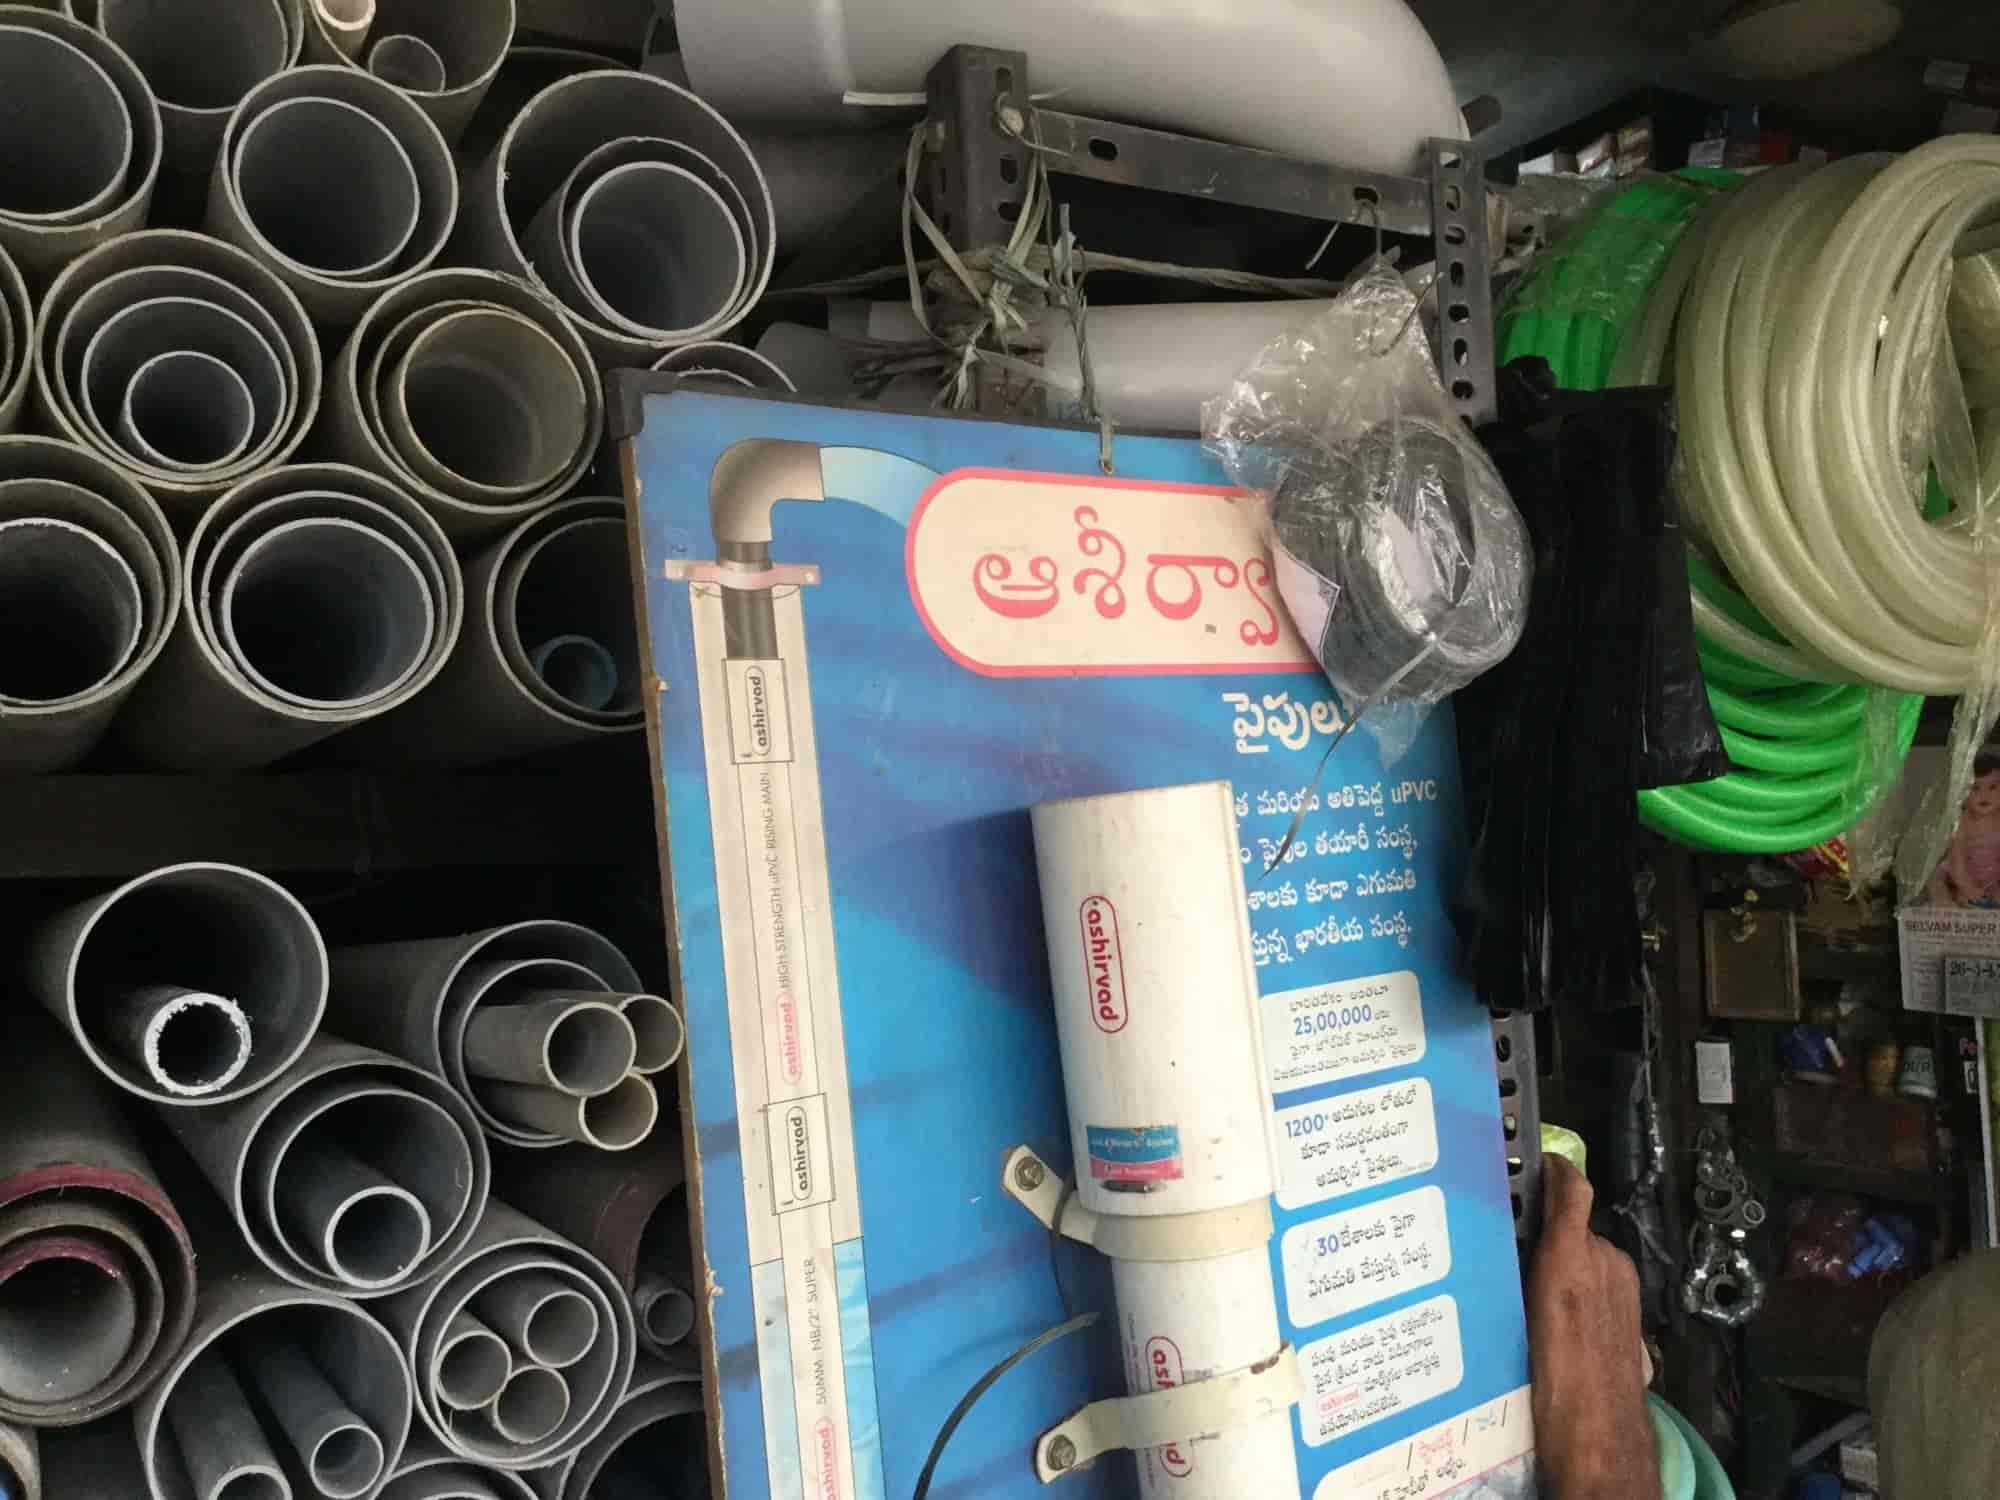 Balaji Agencies Balajee Pvc Pipe Dealers In Chittoor Upvc Electrical Plastic Flexible Wiring Conduit China Justdial